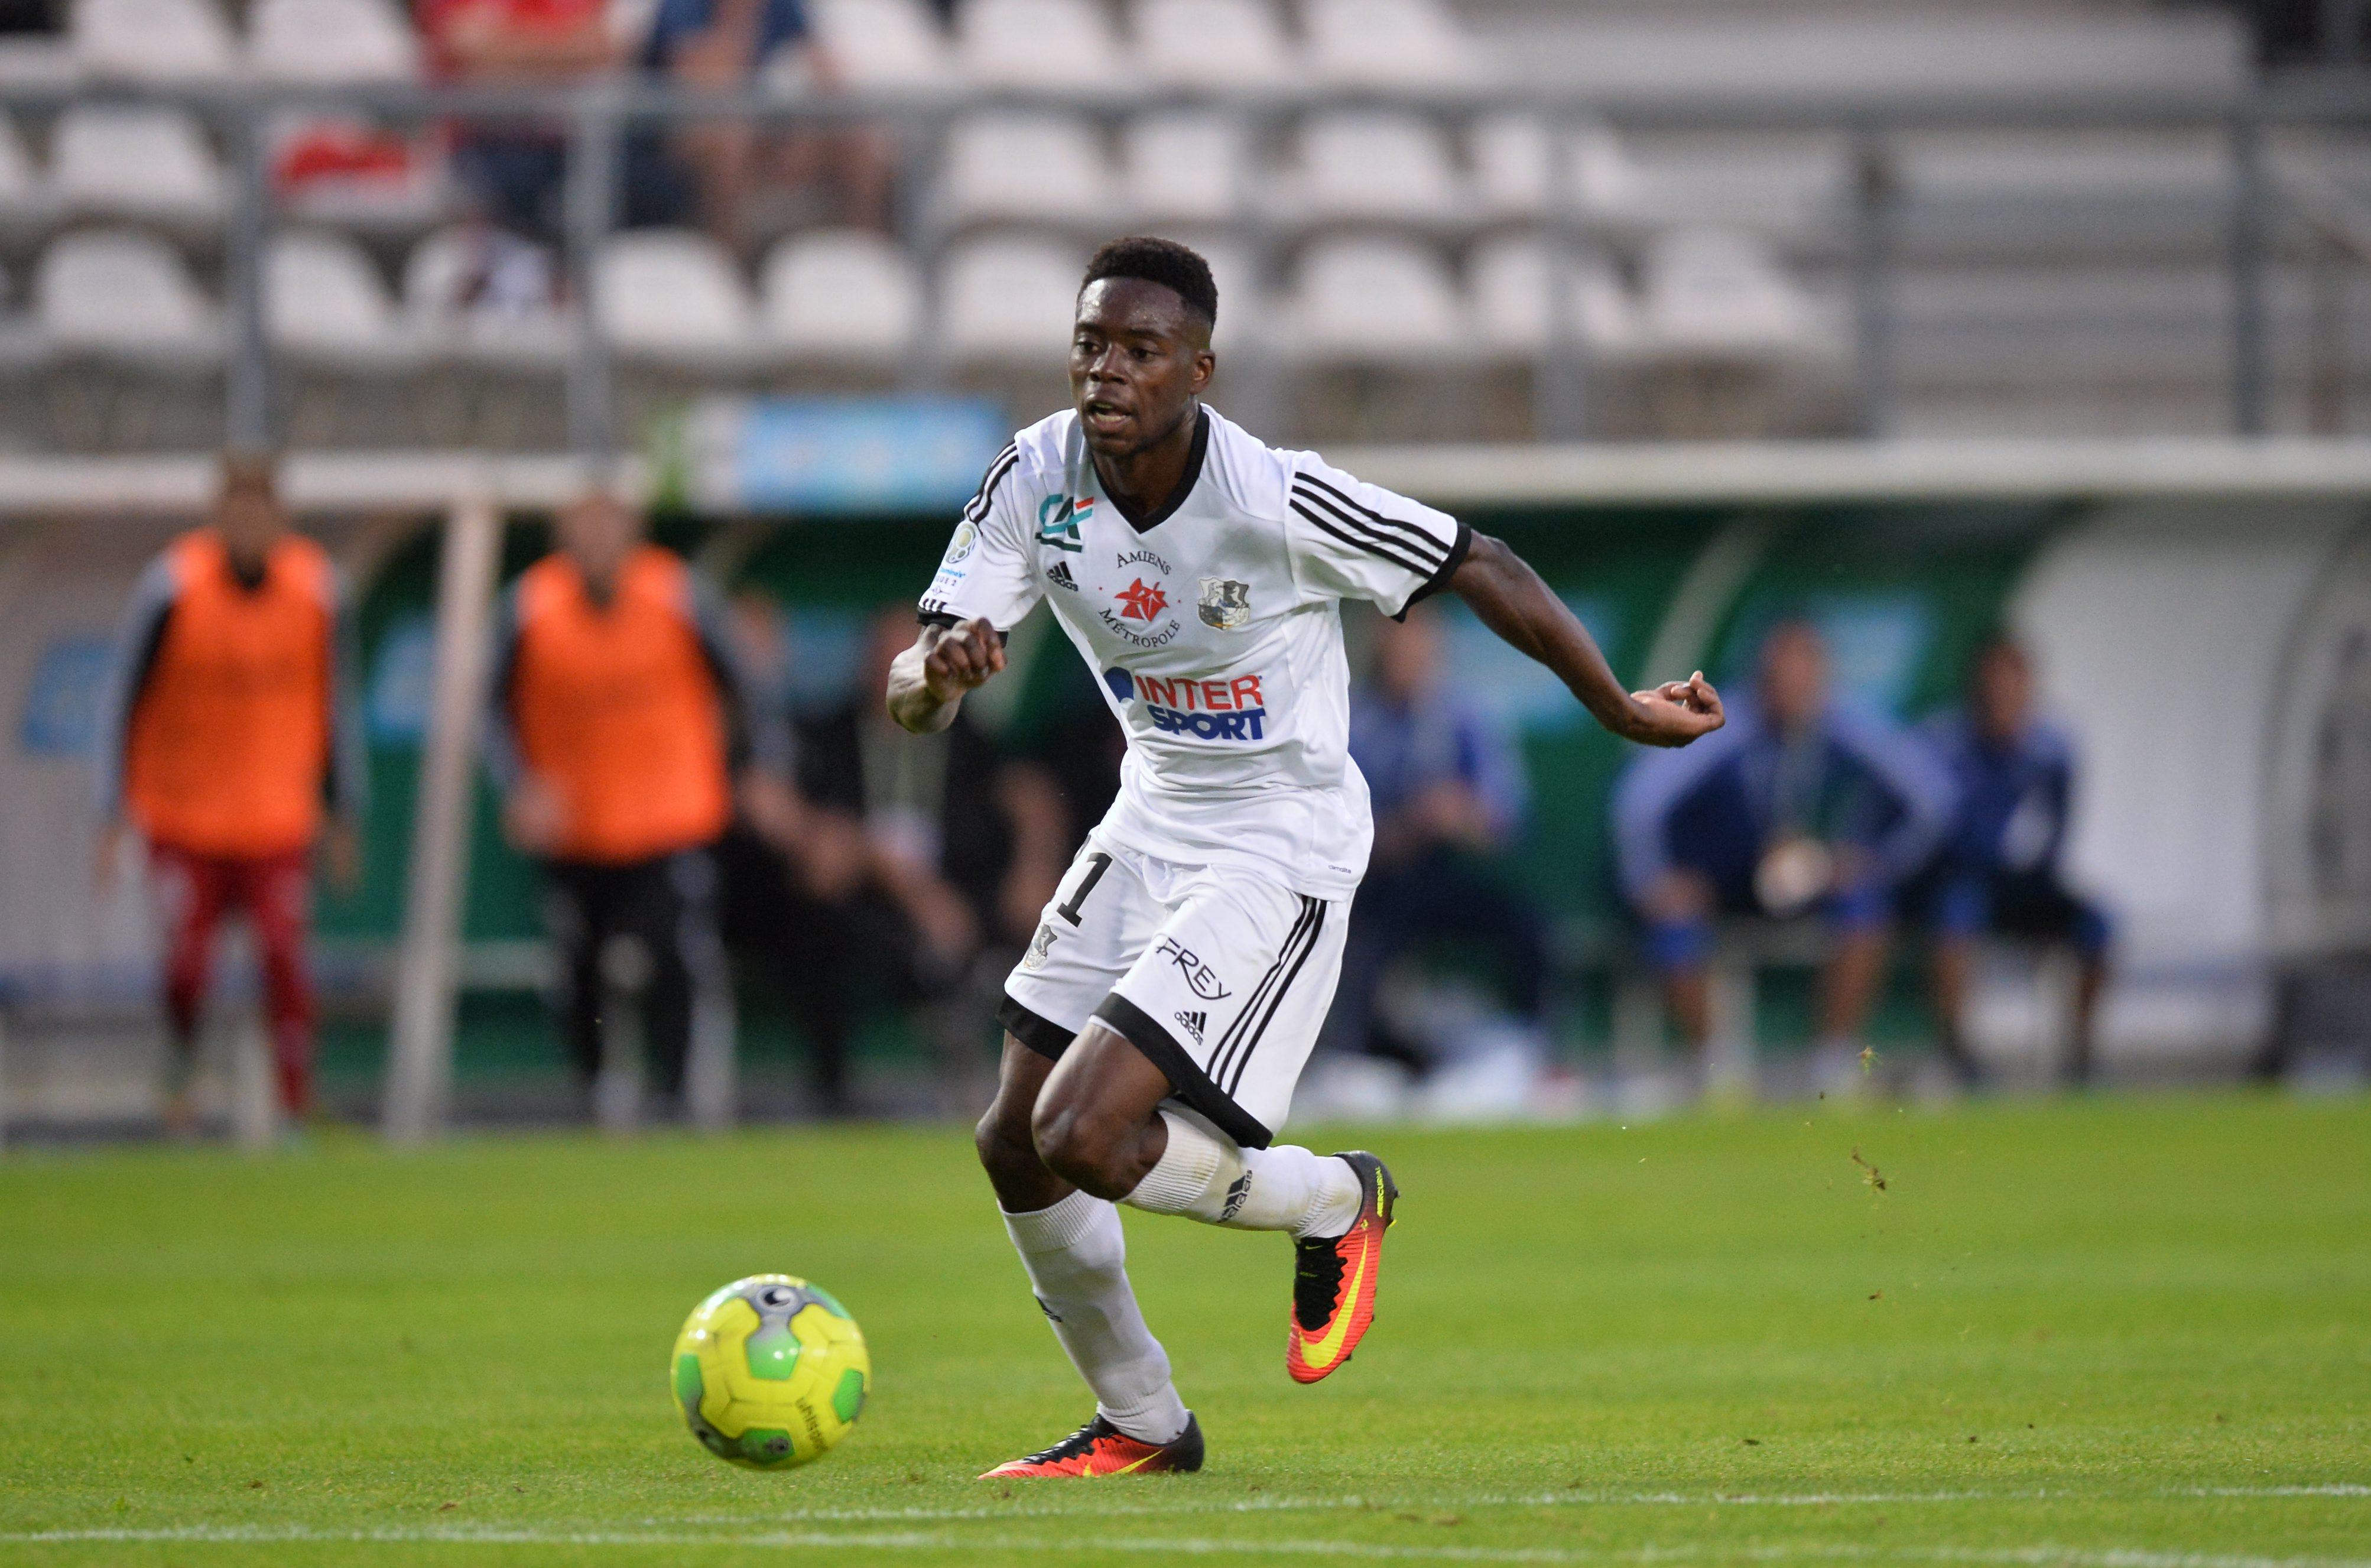 Football - Ligue 2 - Amiens prend les commandes